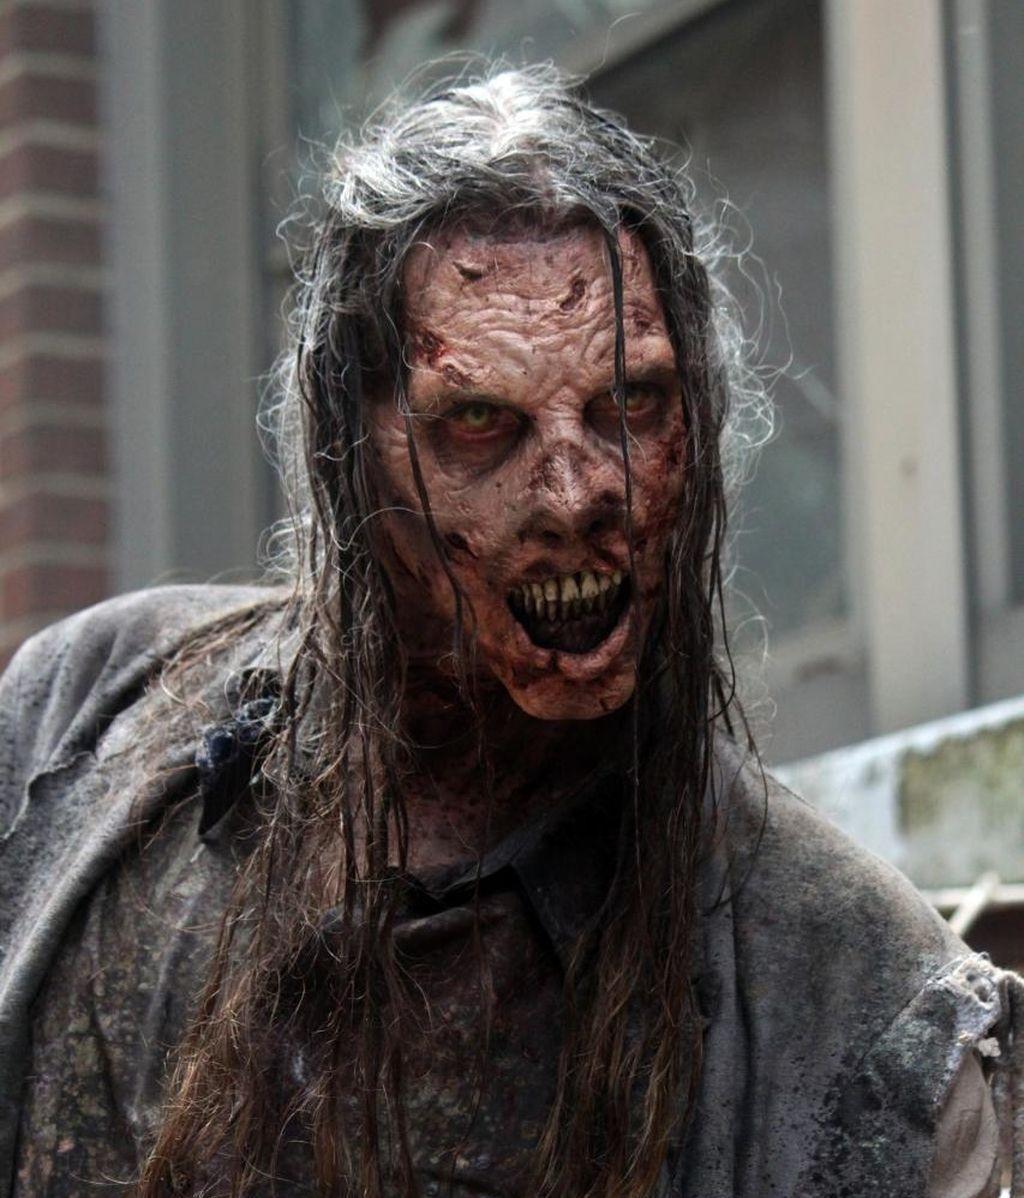 'Zombie' 'The walking dead' temporada 5